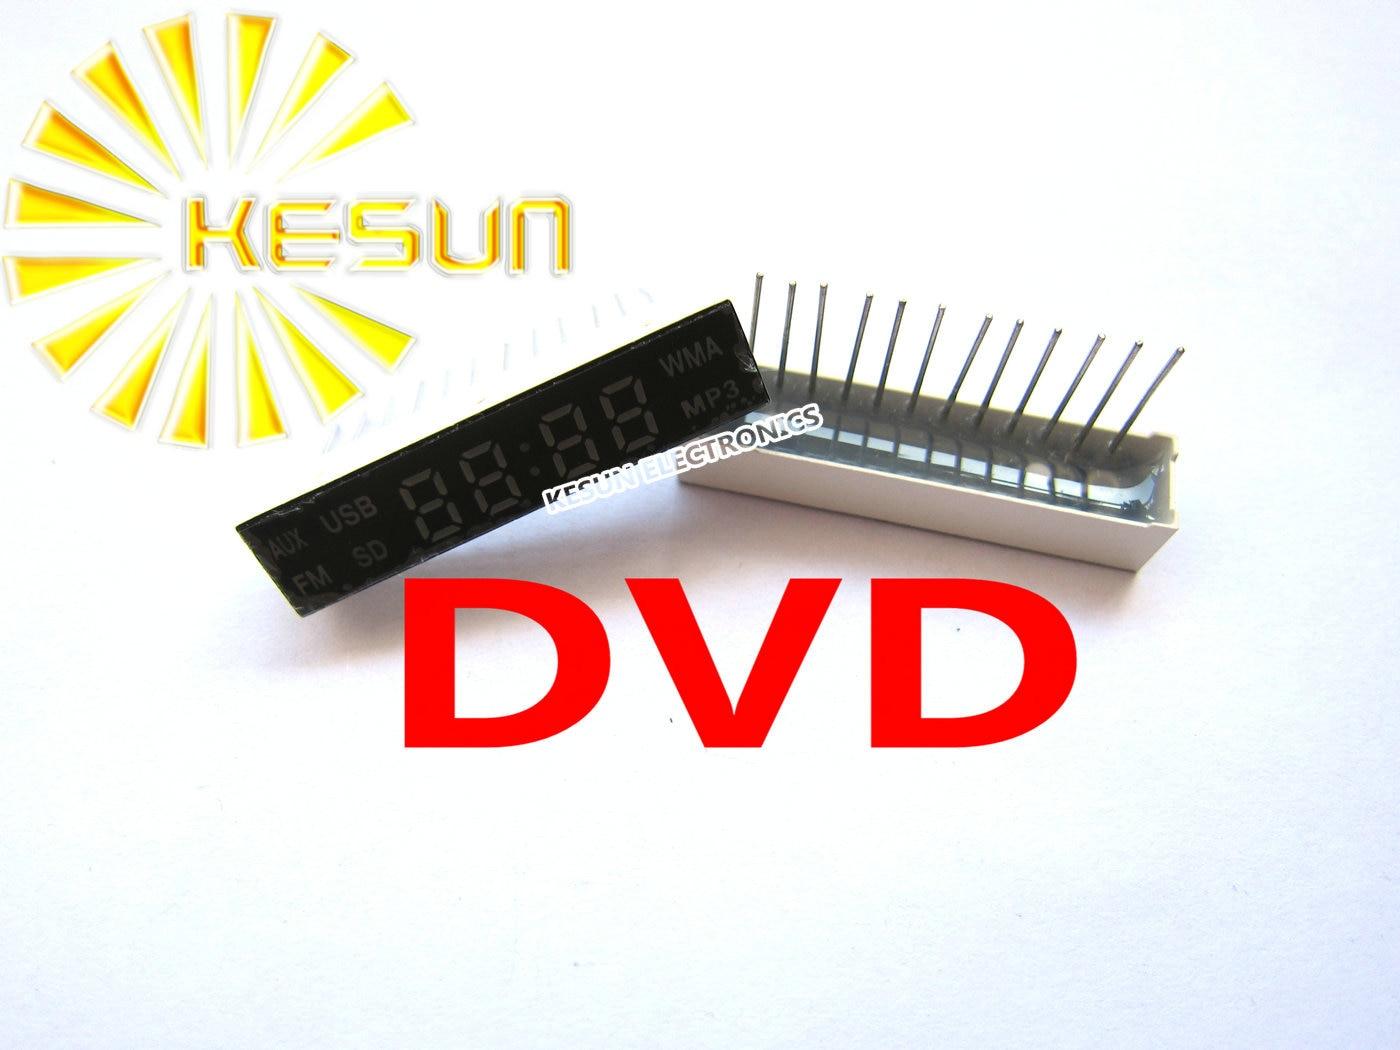 100PCS X DVD Display Red Digital Tube LED Display Module